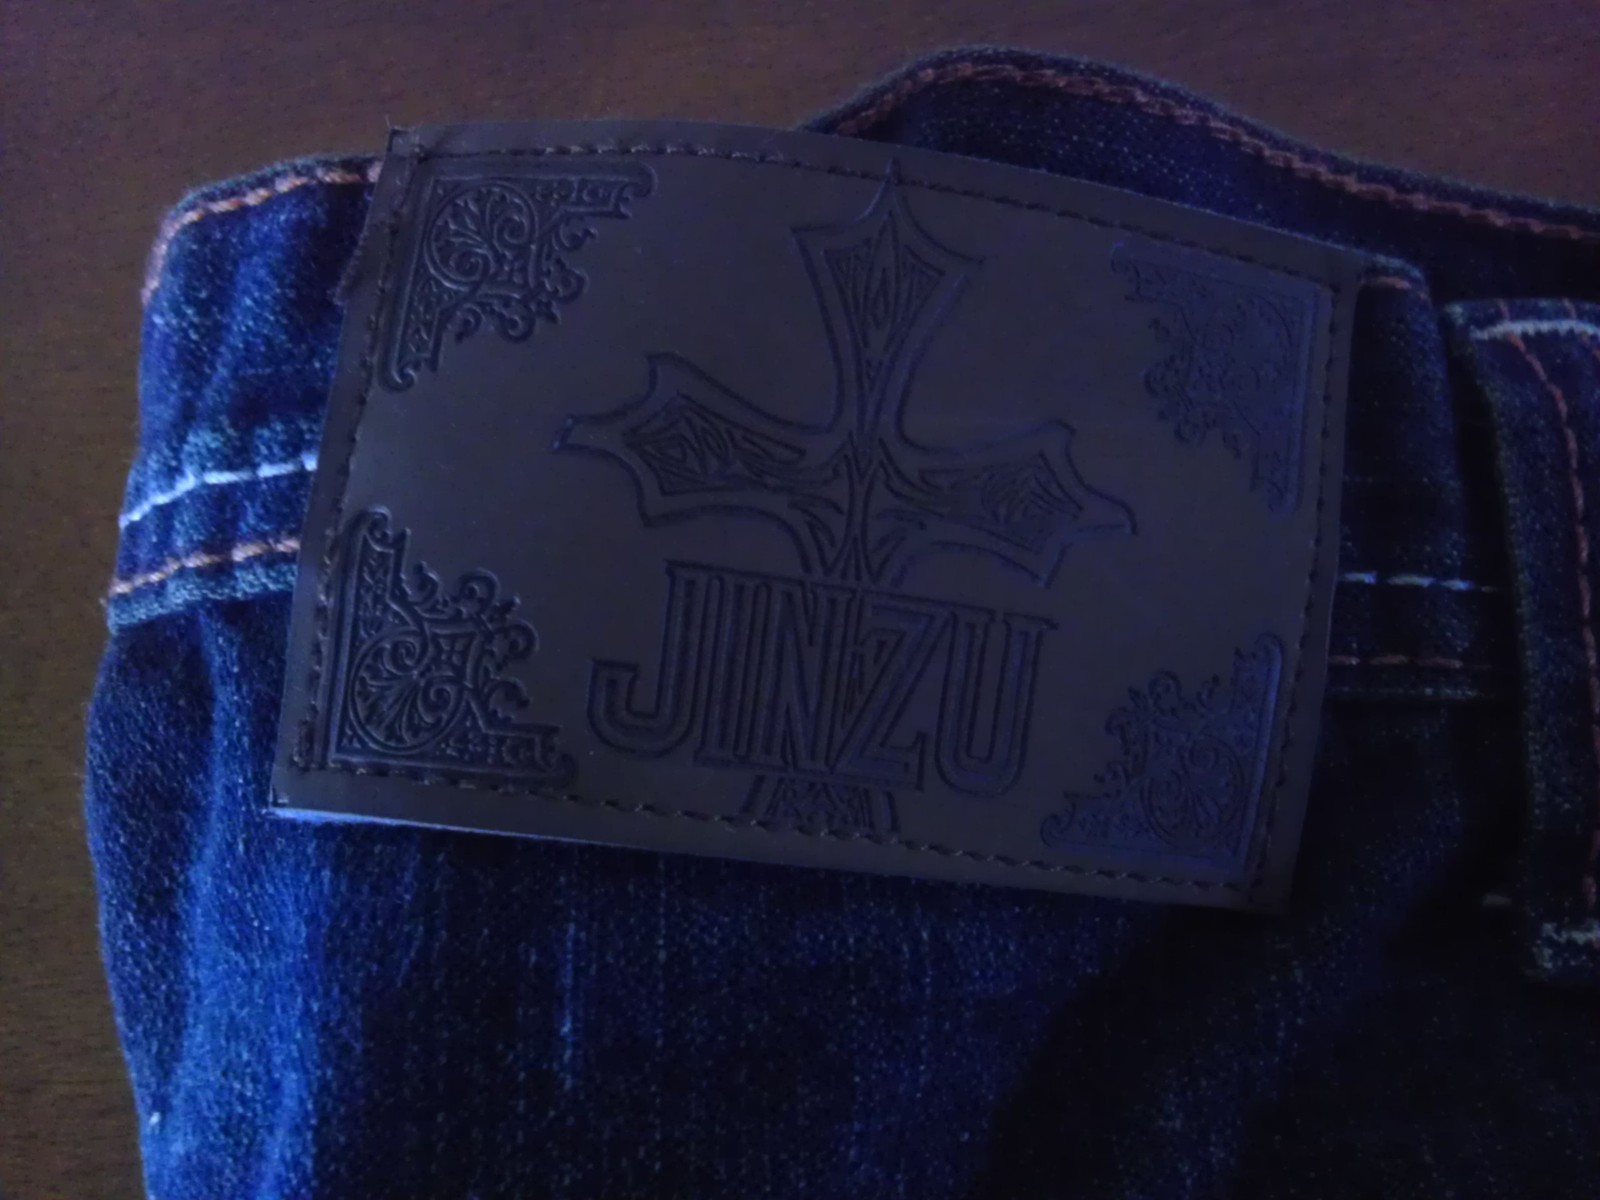 JINZU Jeans Company men's urban hip hop denim W34 L32